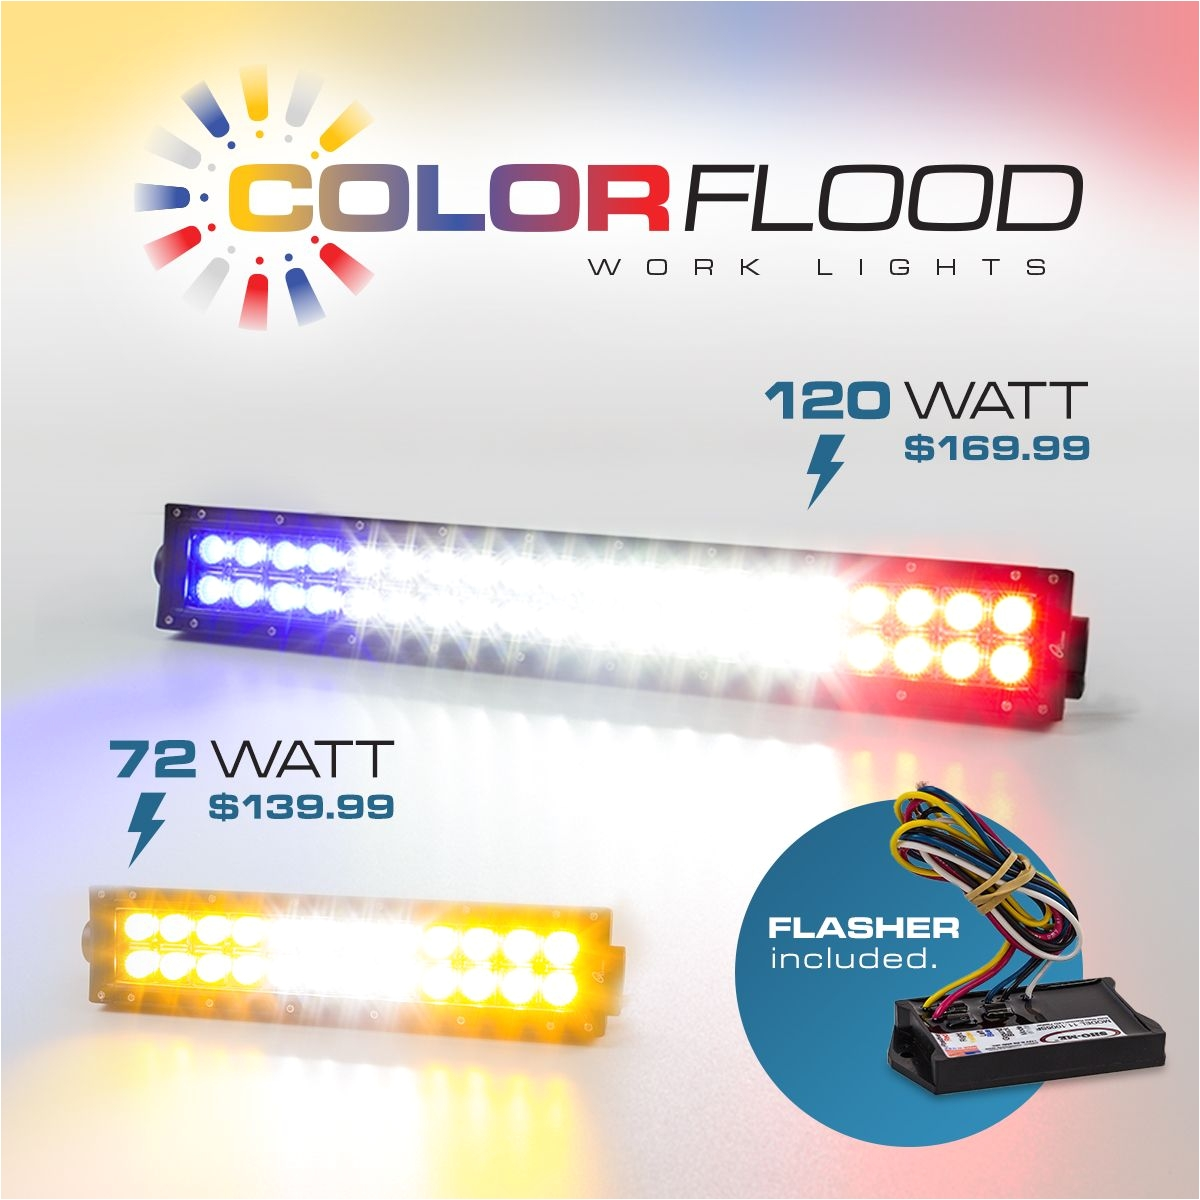 ultra bright lightz ubl color flood work lights www ultrabrightlightz com